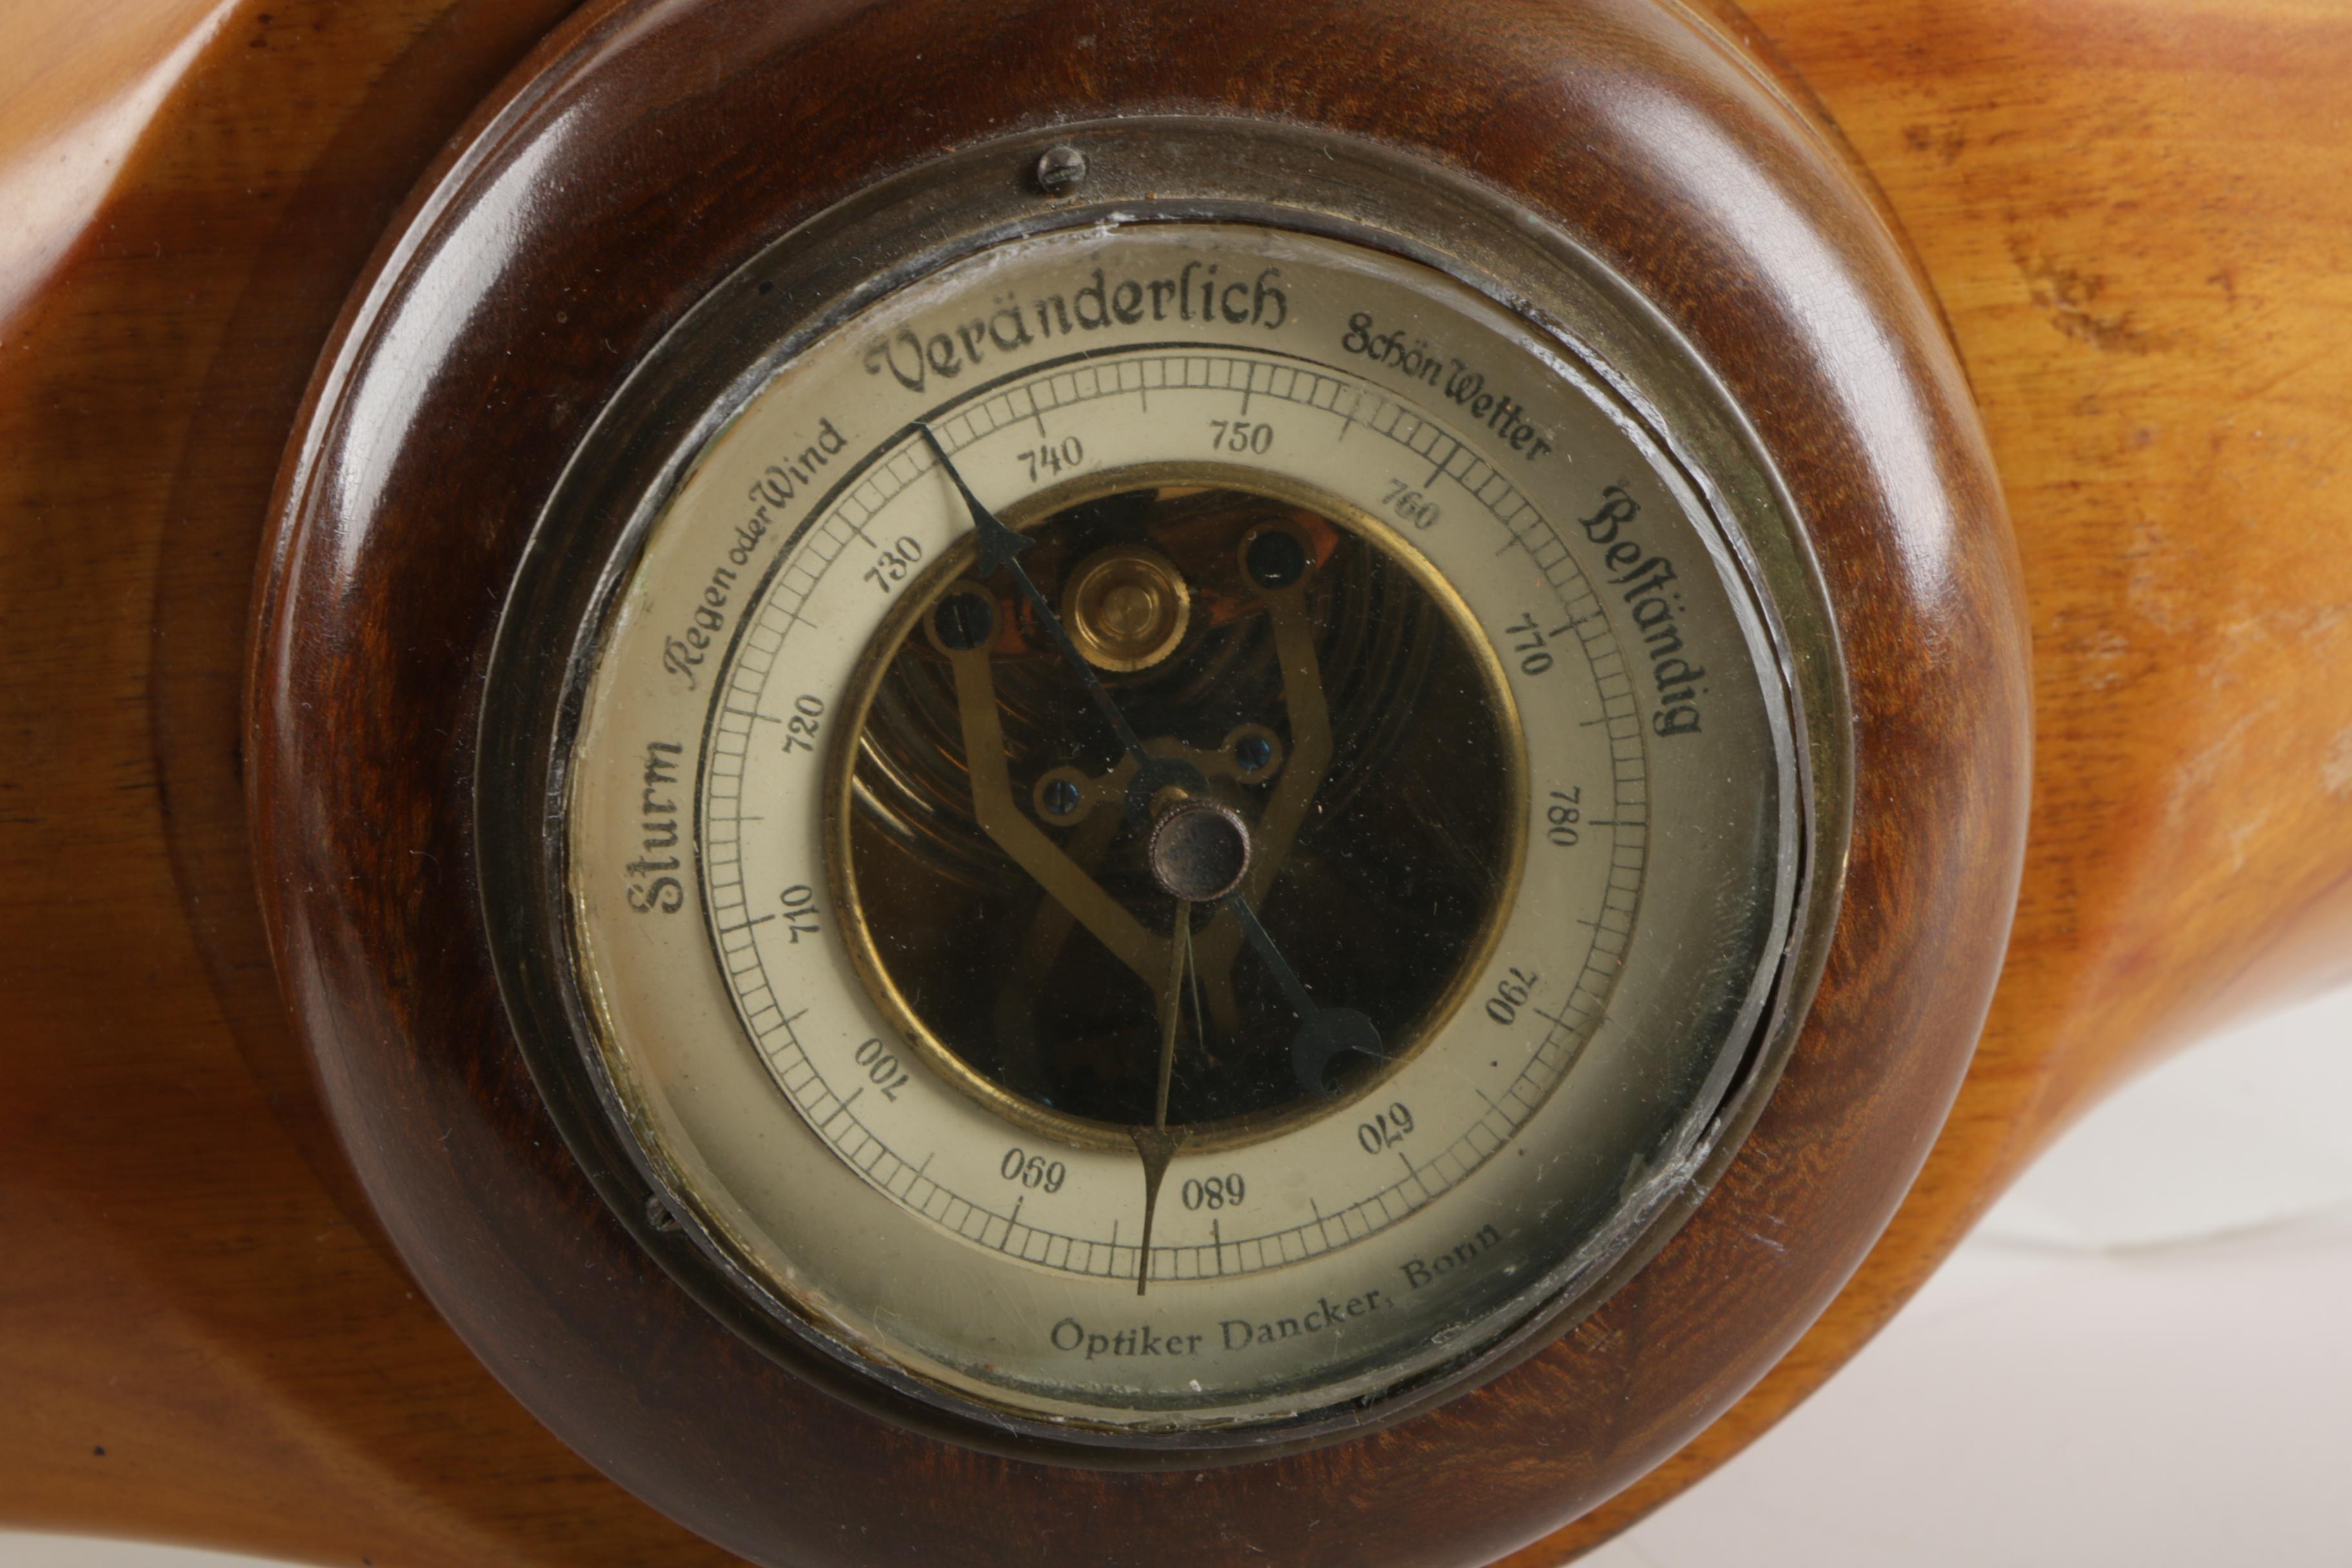 German Barometer Set in World War II Era Wooden Airplane Propeller